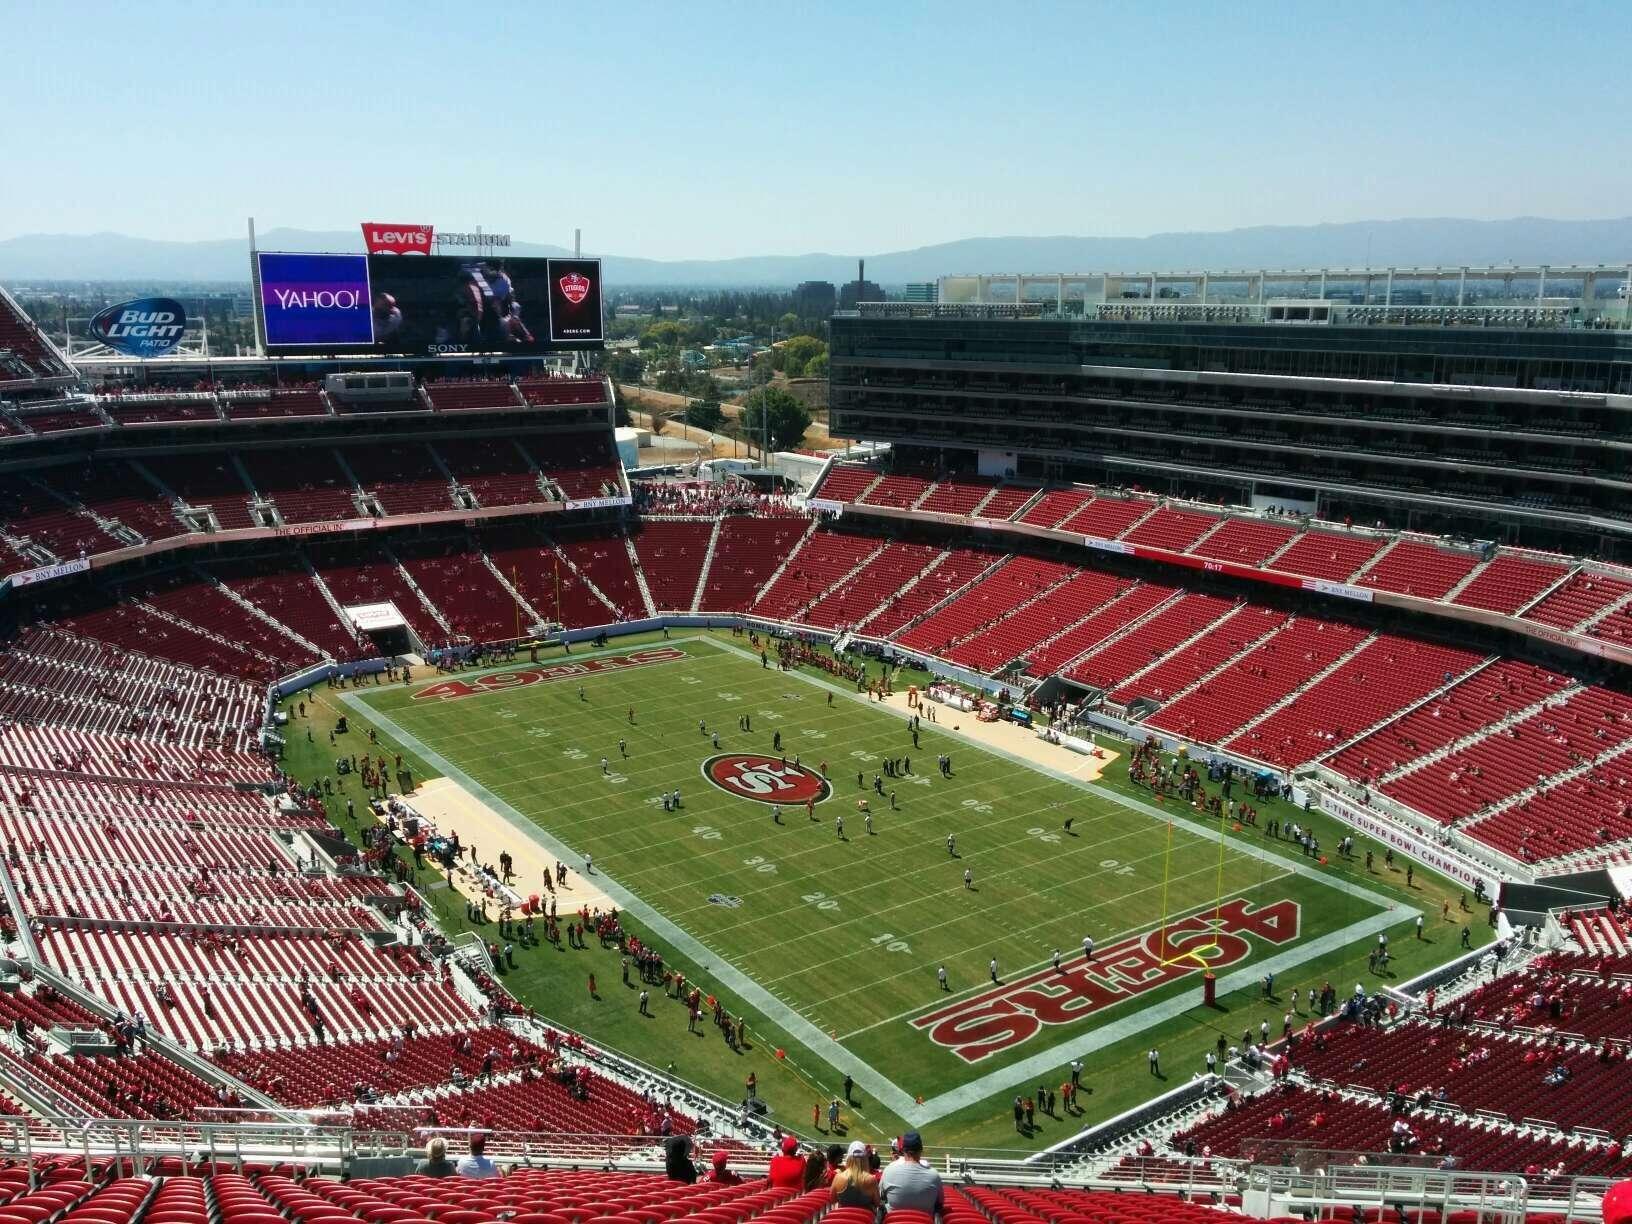 Levi S Stadium Section 403 Row 24 Seat 11 San Francisco